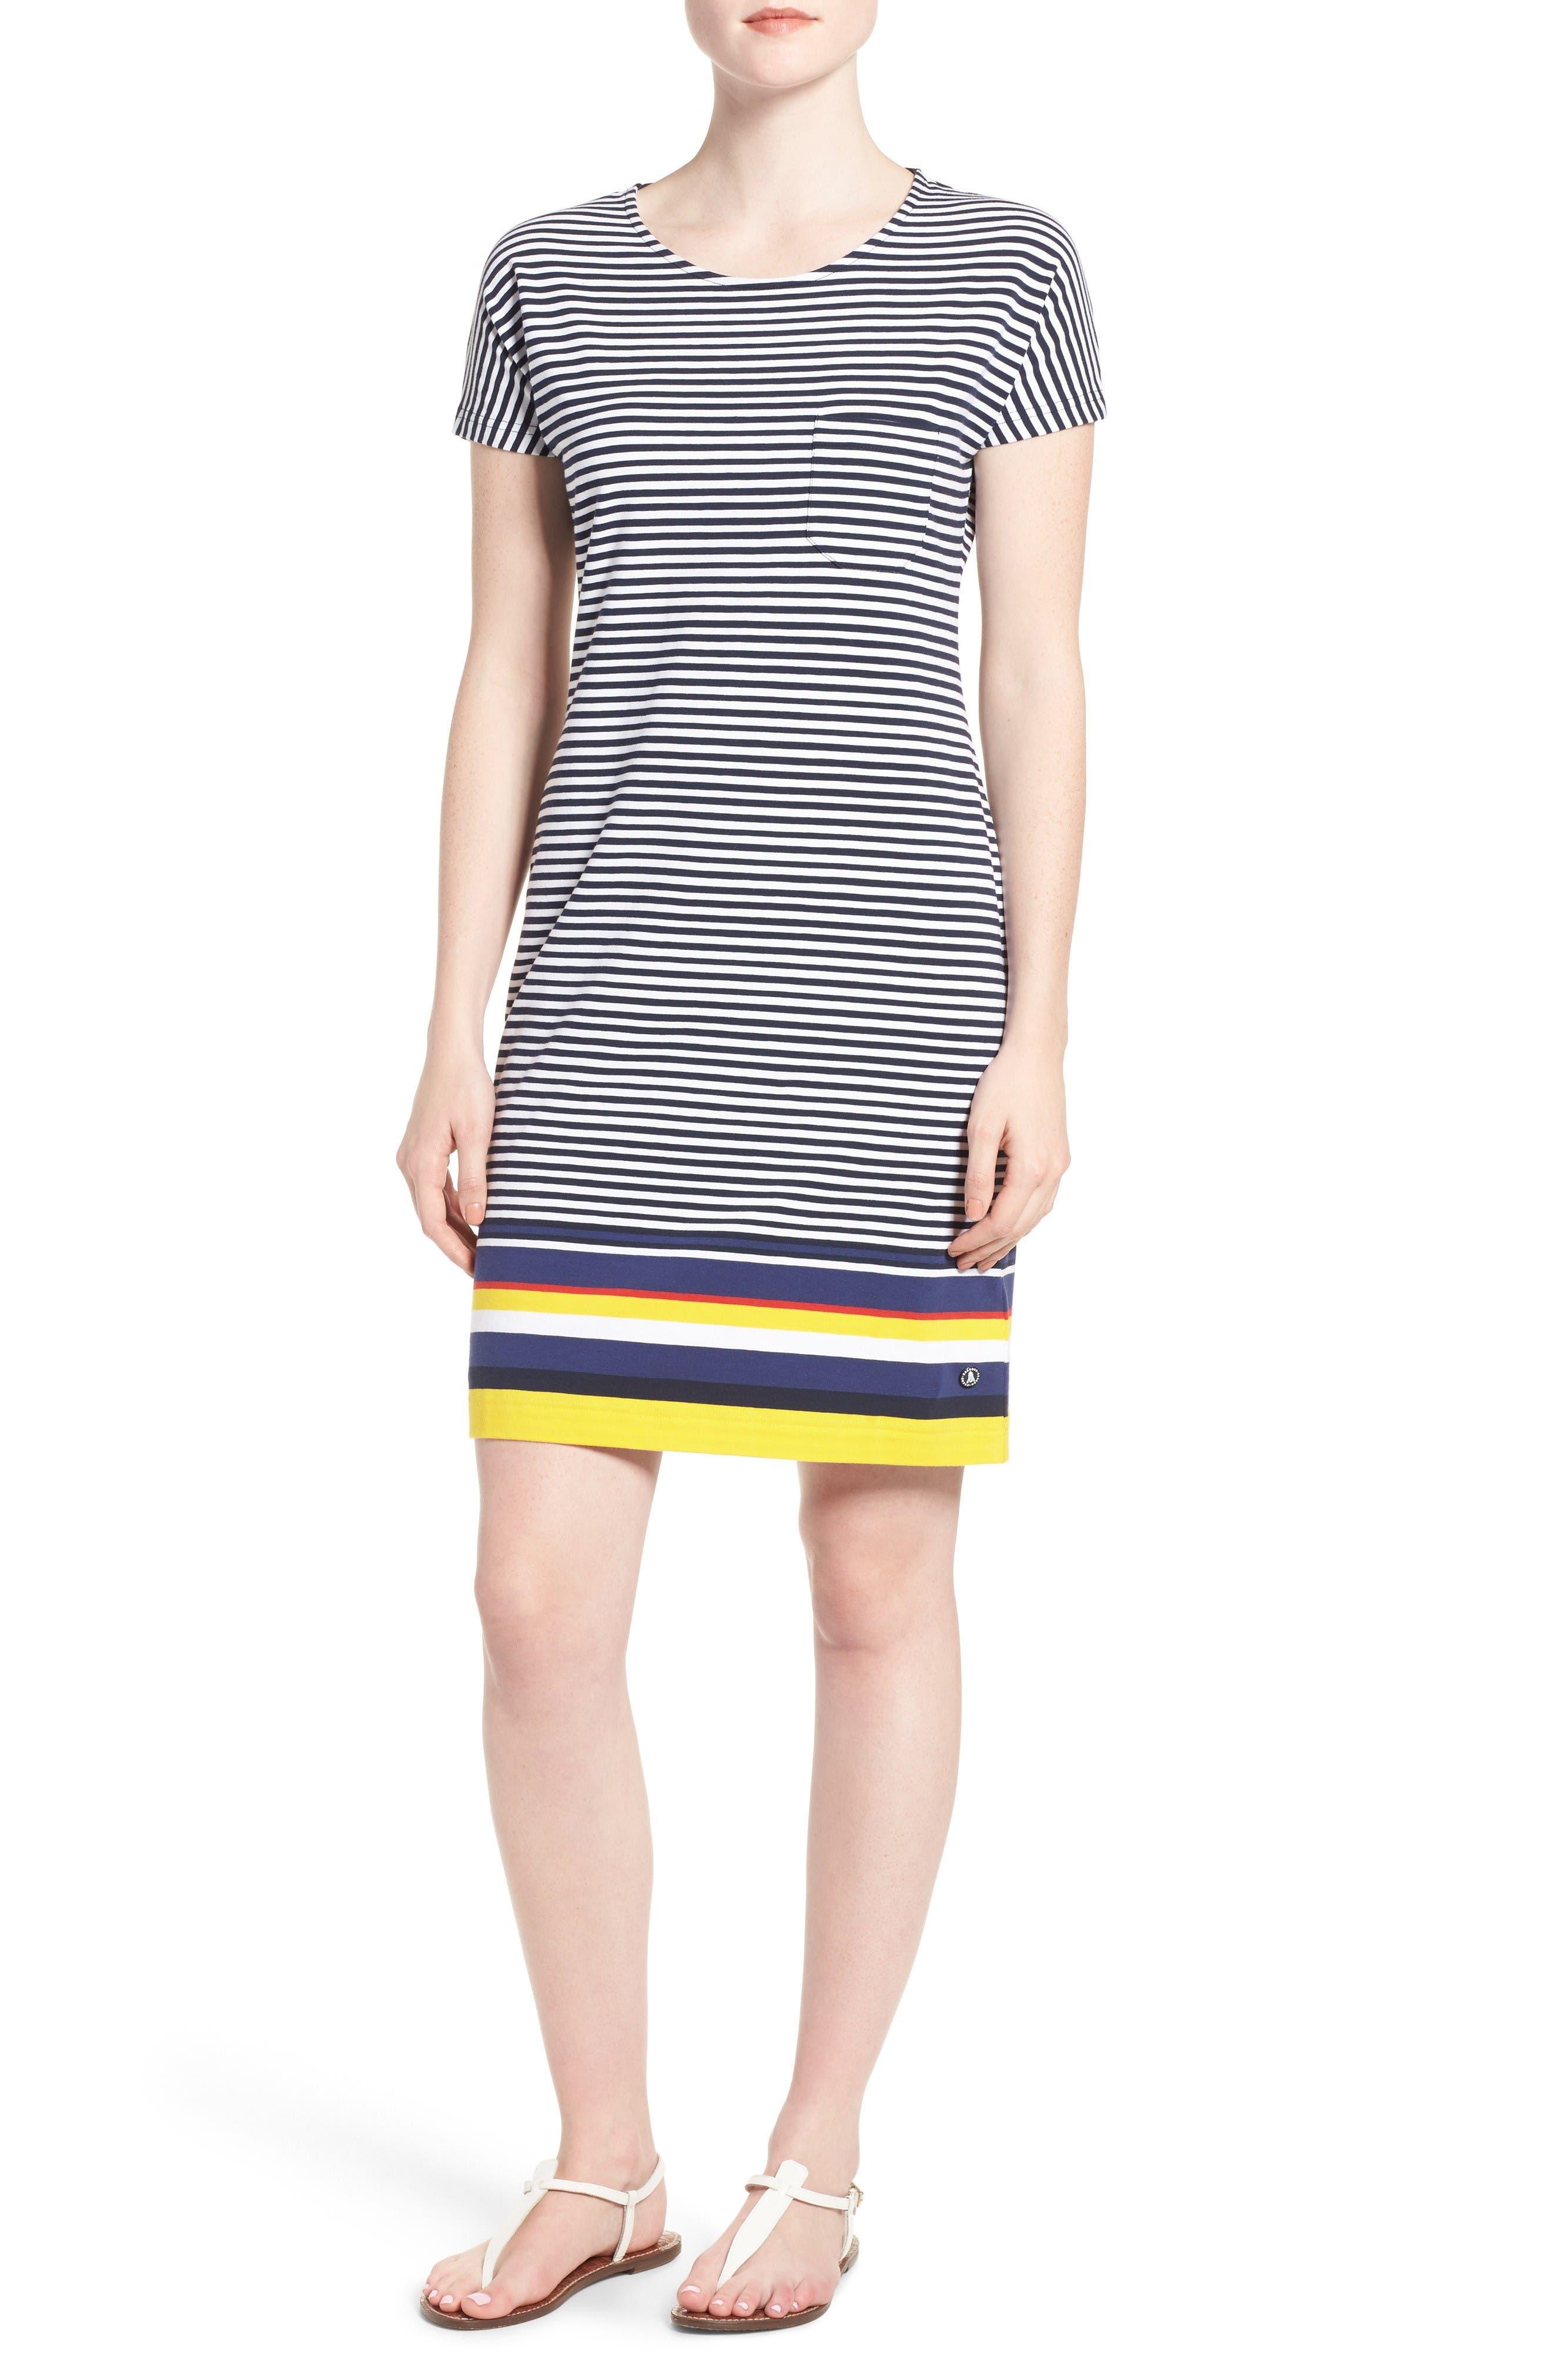 Barbour 'Harewood' Stripe Jersey Short Sleeve Shift Dress